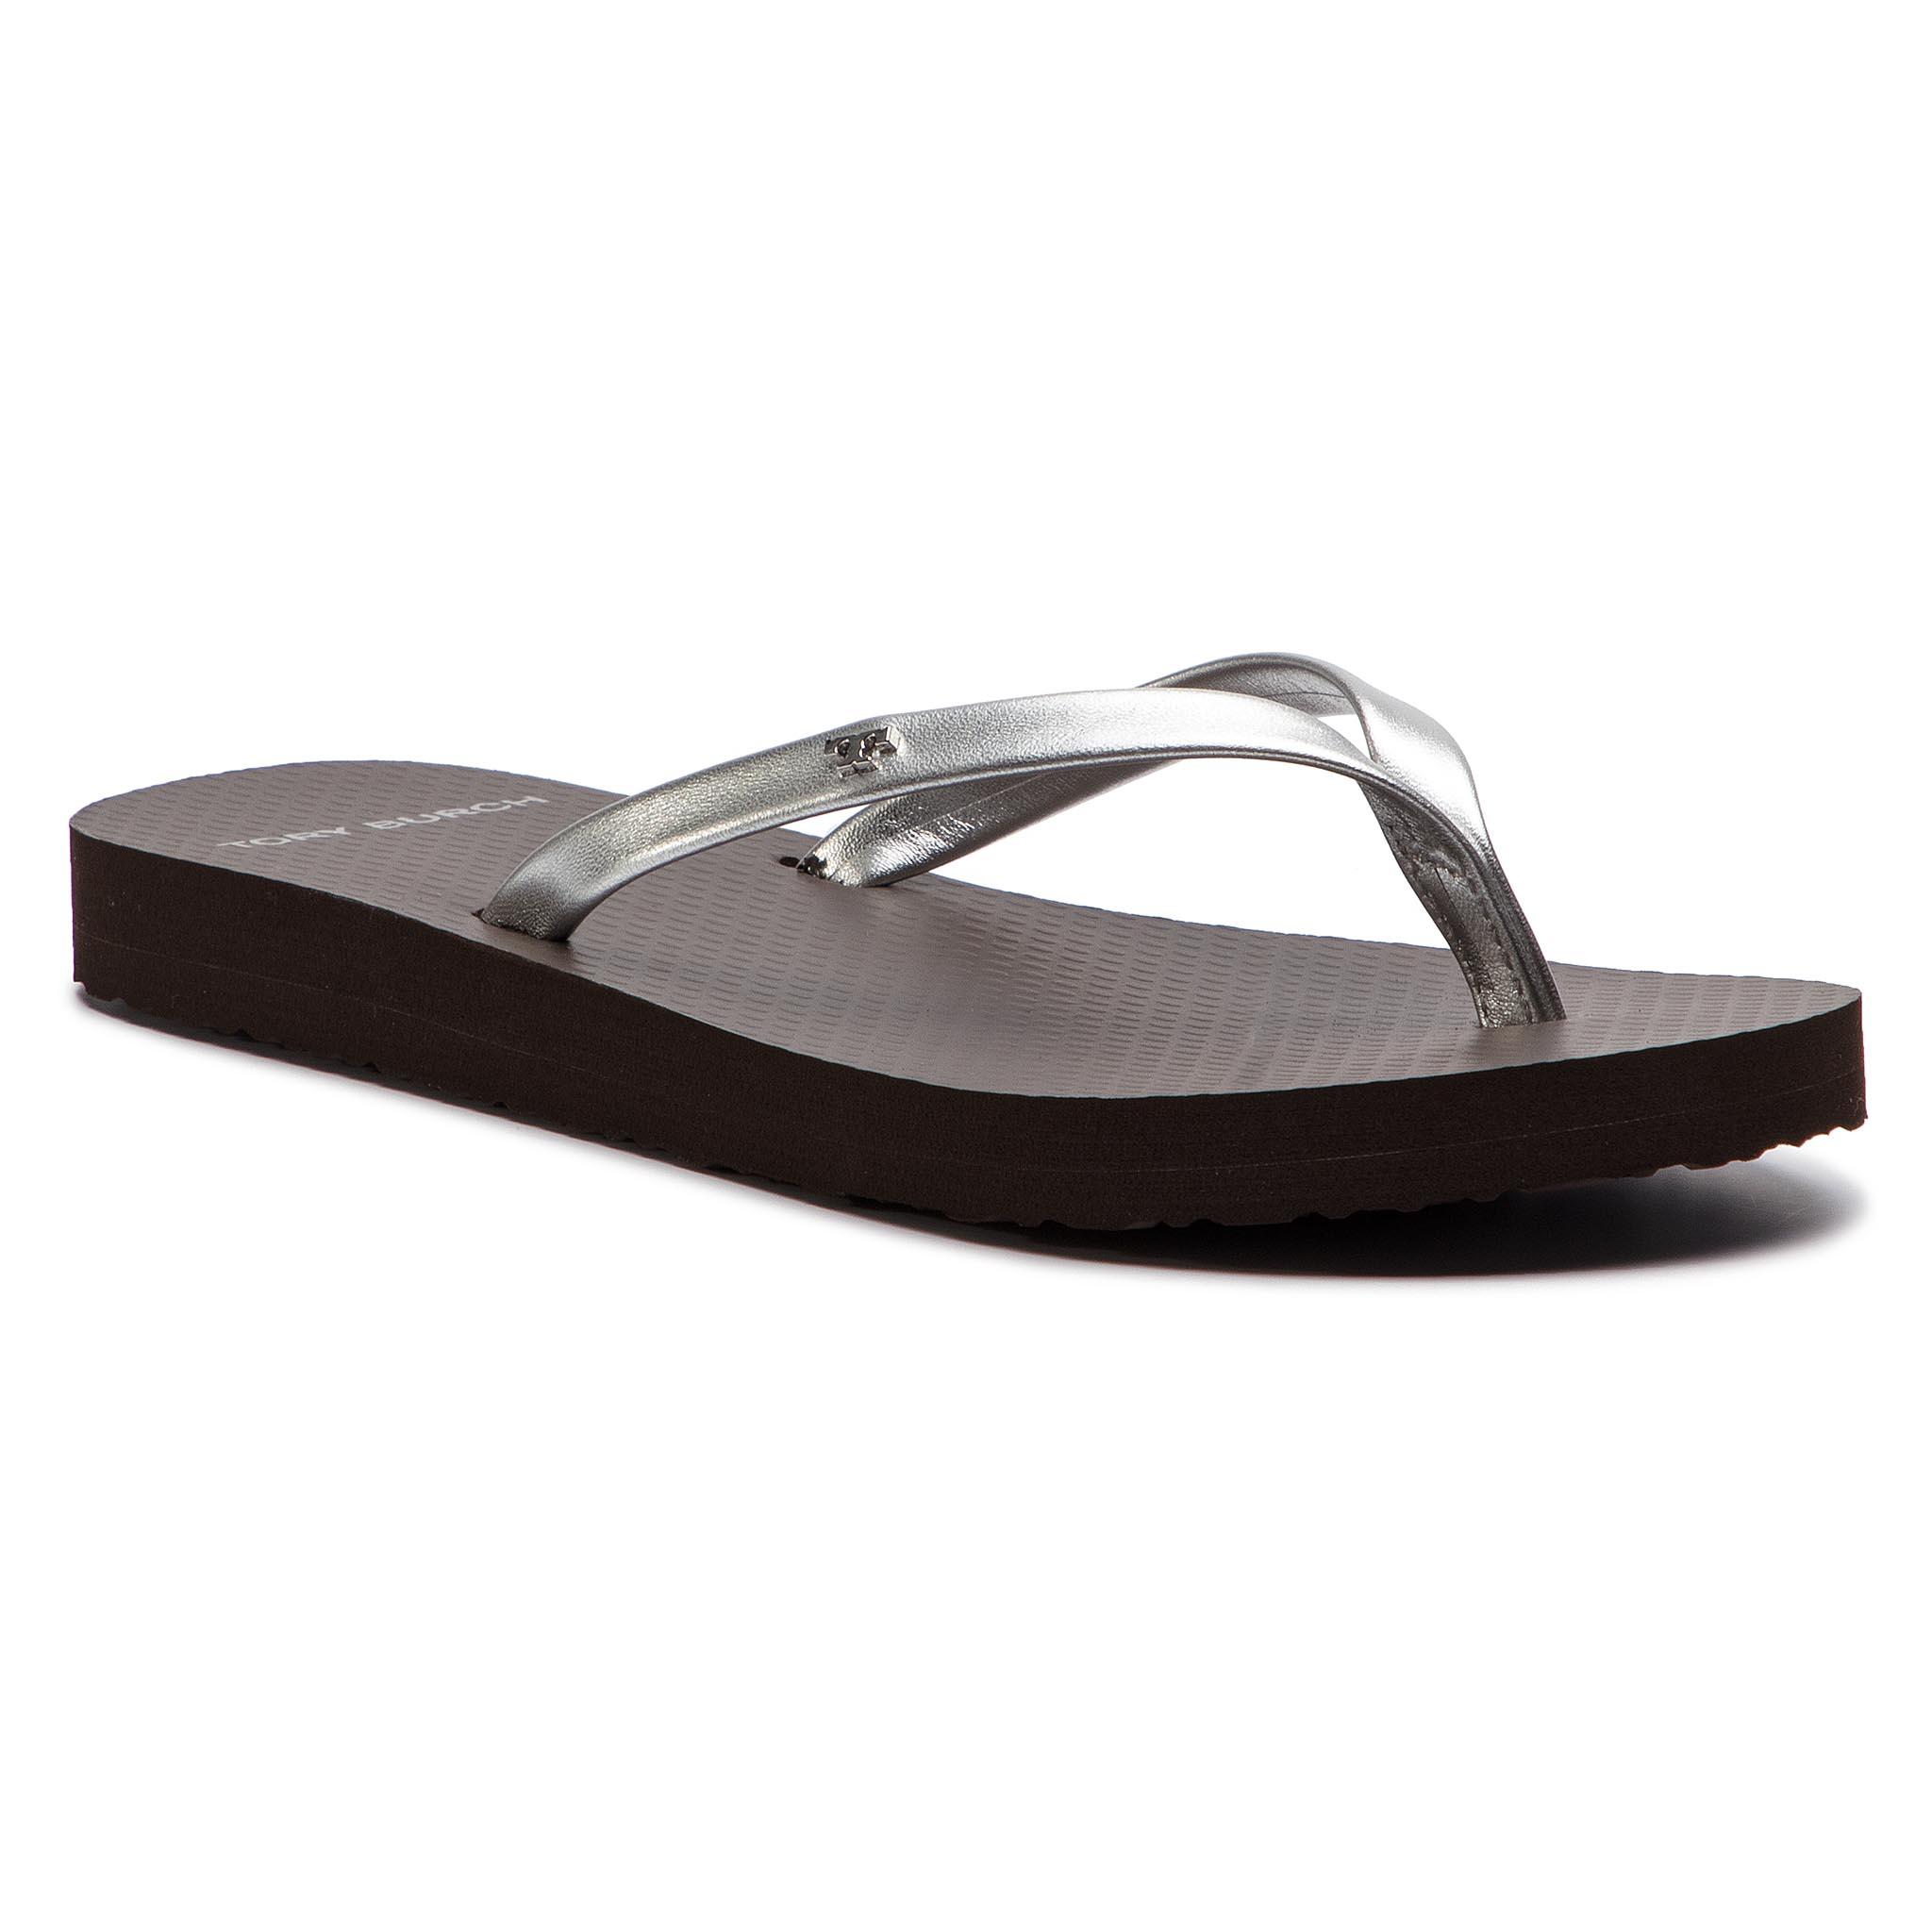 606ca94d6 Slides TORY BURCH Metallic Leather Flip Flop 54890 Silver Demi Tasse 040